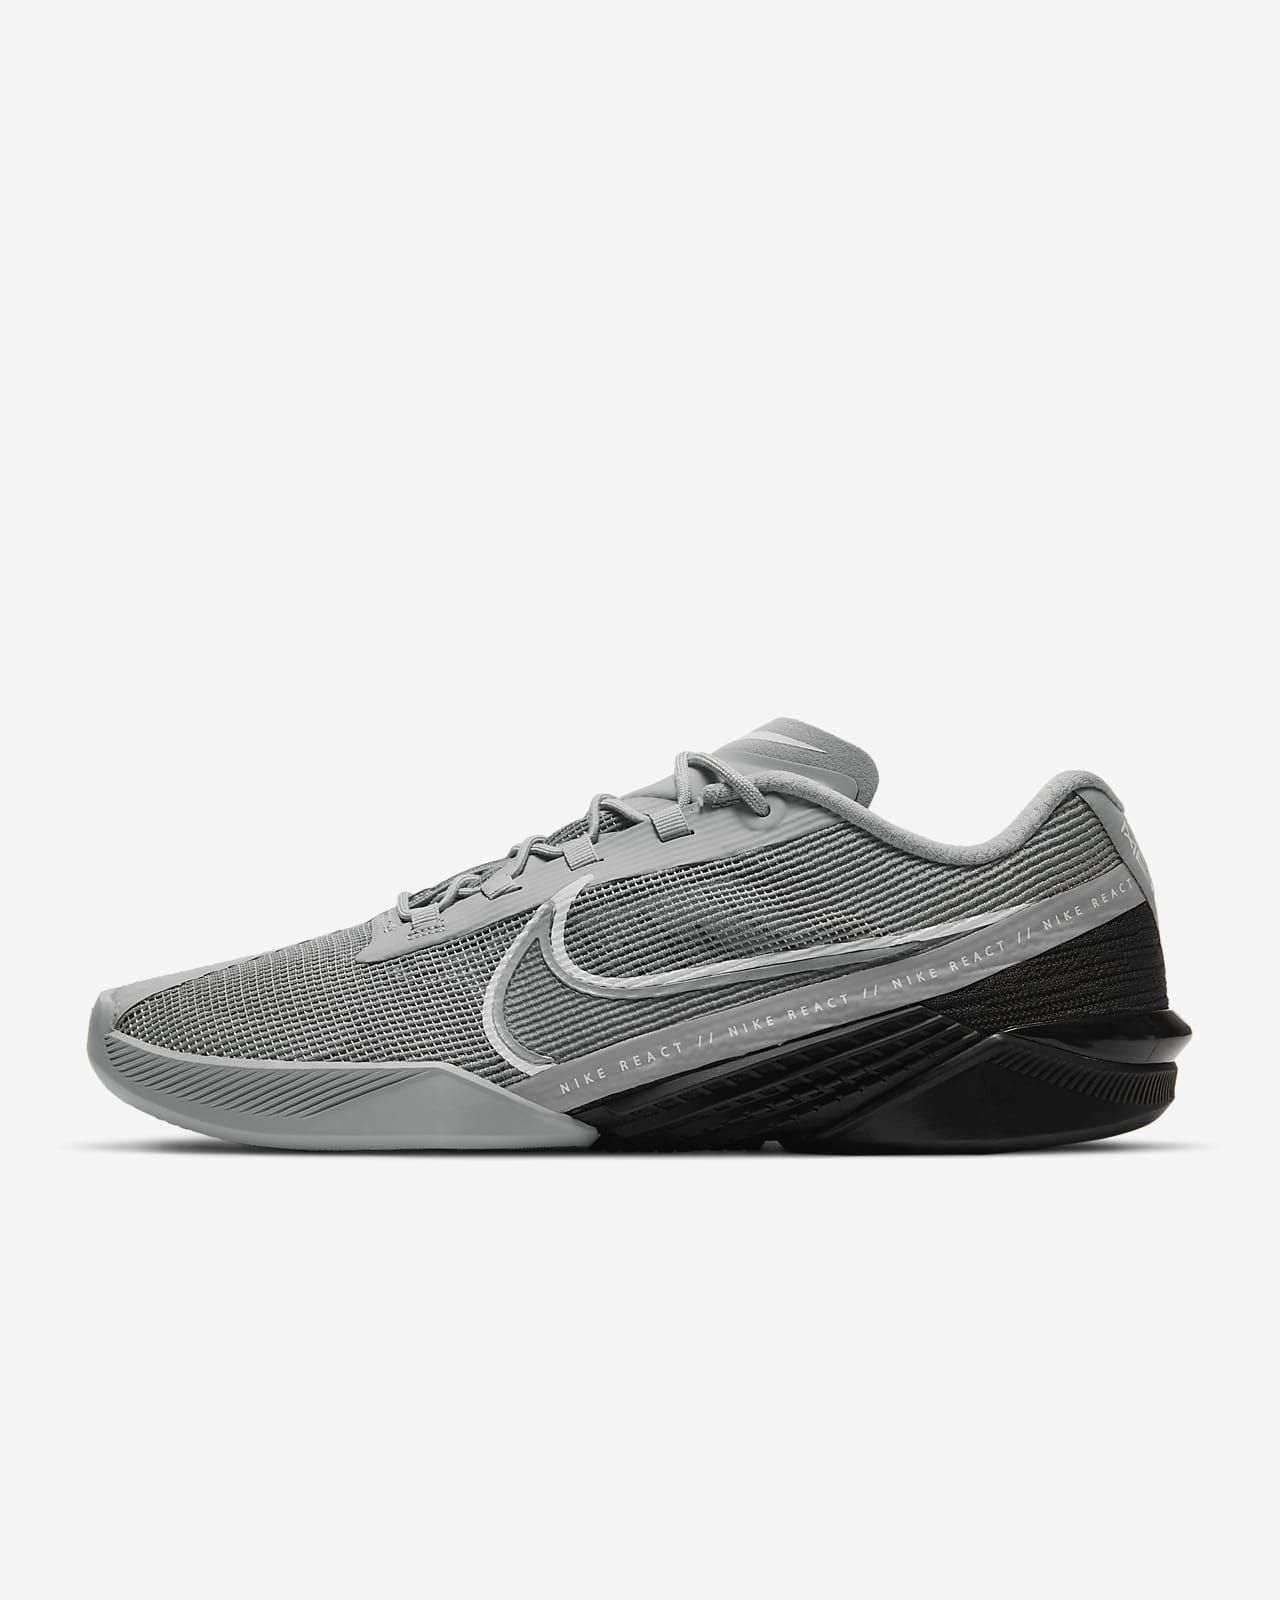 Chaussure de training Nike React Metcon Turbo